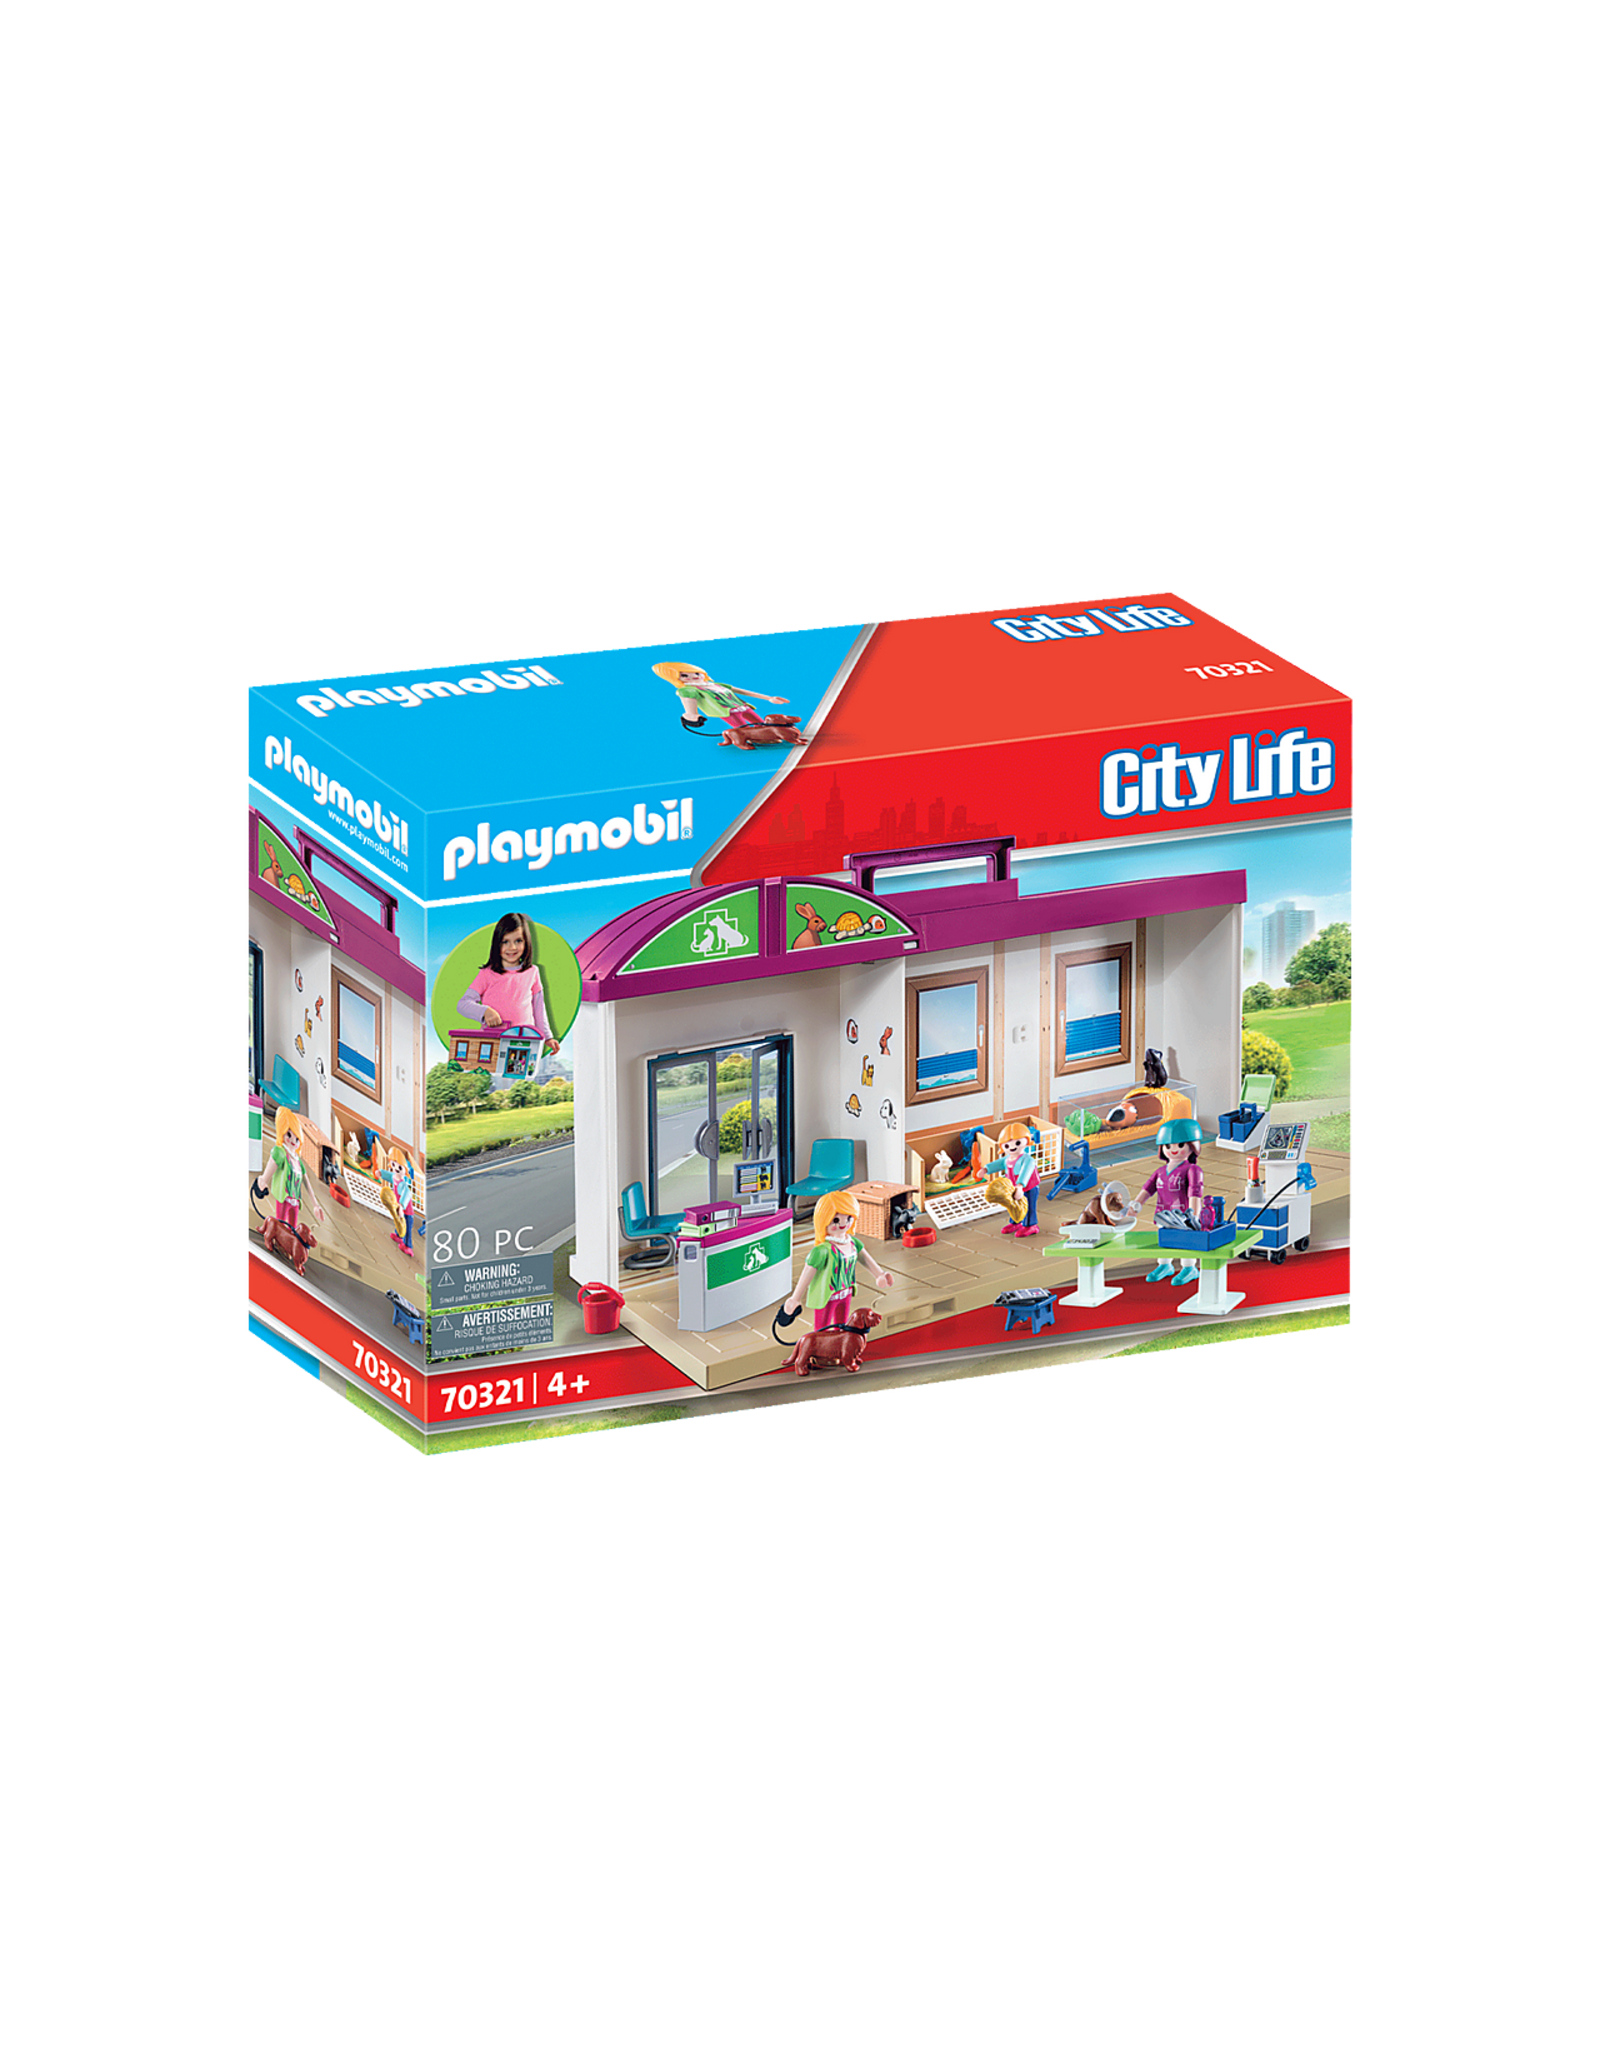 Playmobil Playmobil Citylife 70321 Take Along Vet Clinic